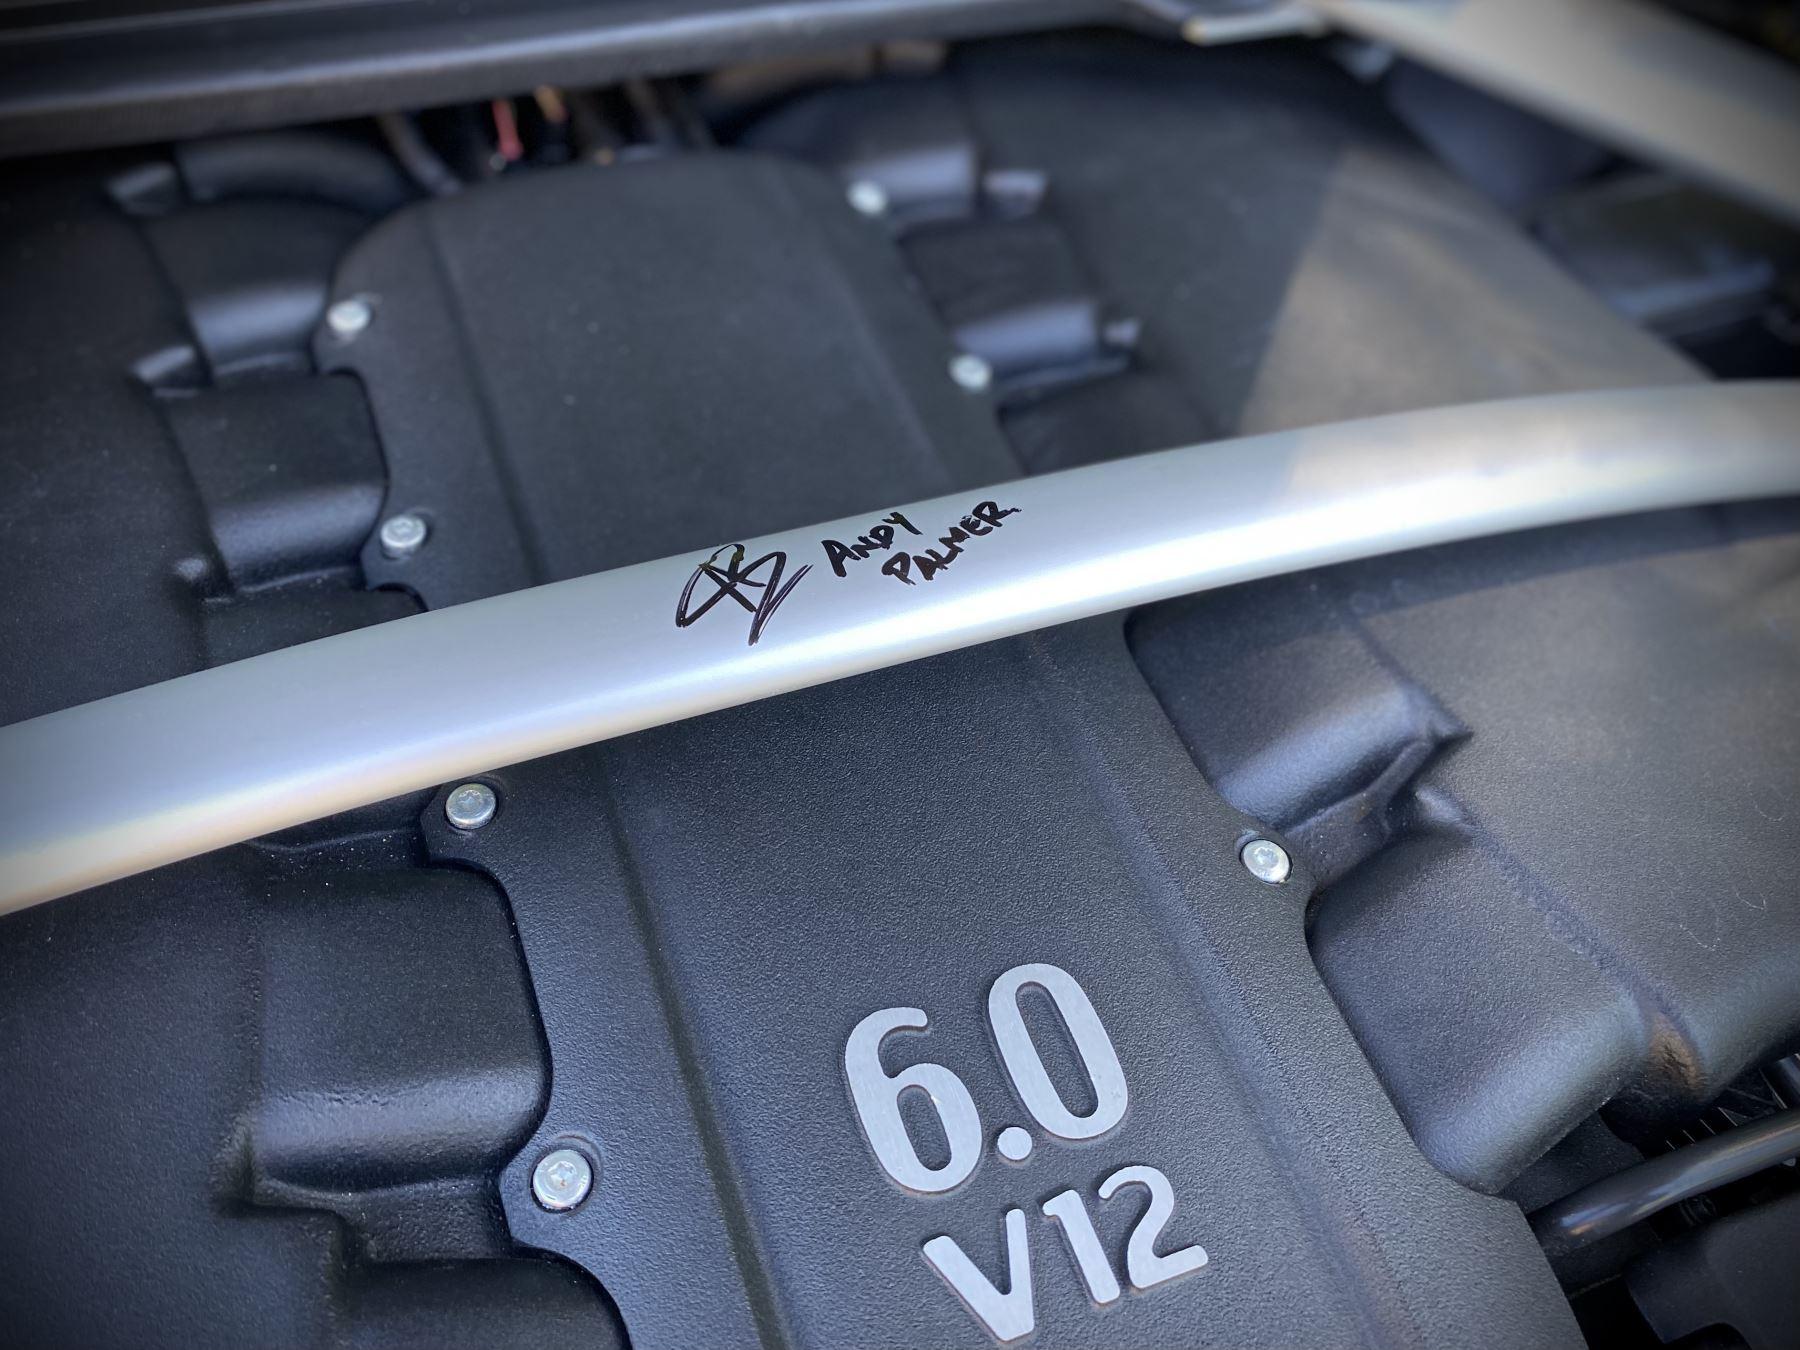 Aston Martin V12 Vantage AMR 6.0 V12 600BHP Manual 1 of 100.     1 Owner From New, Full Aston Martin History. image 15